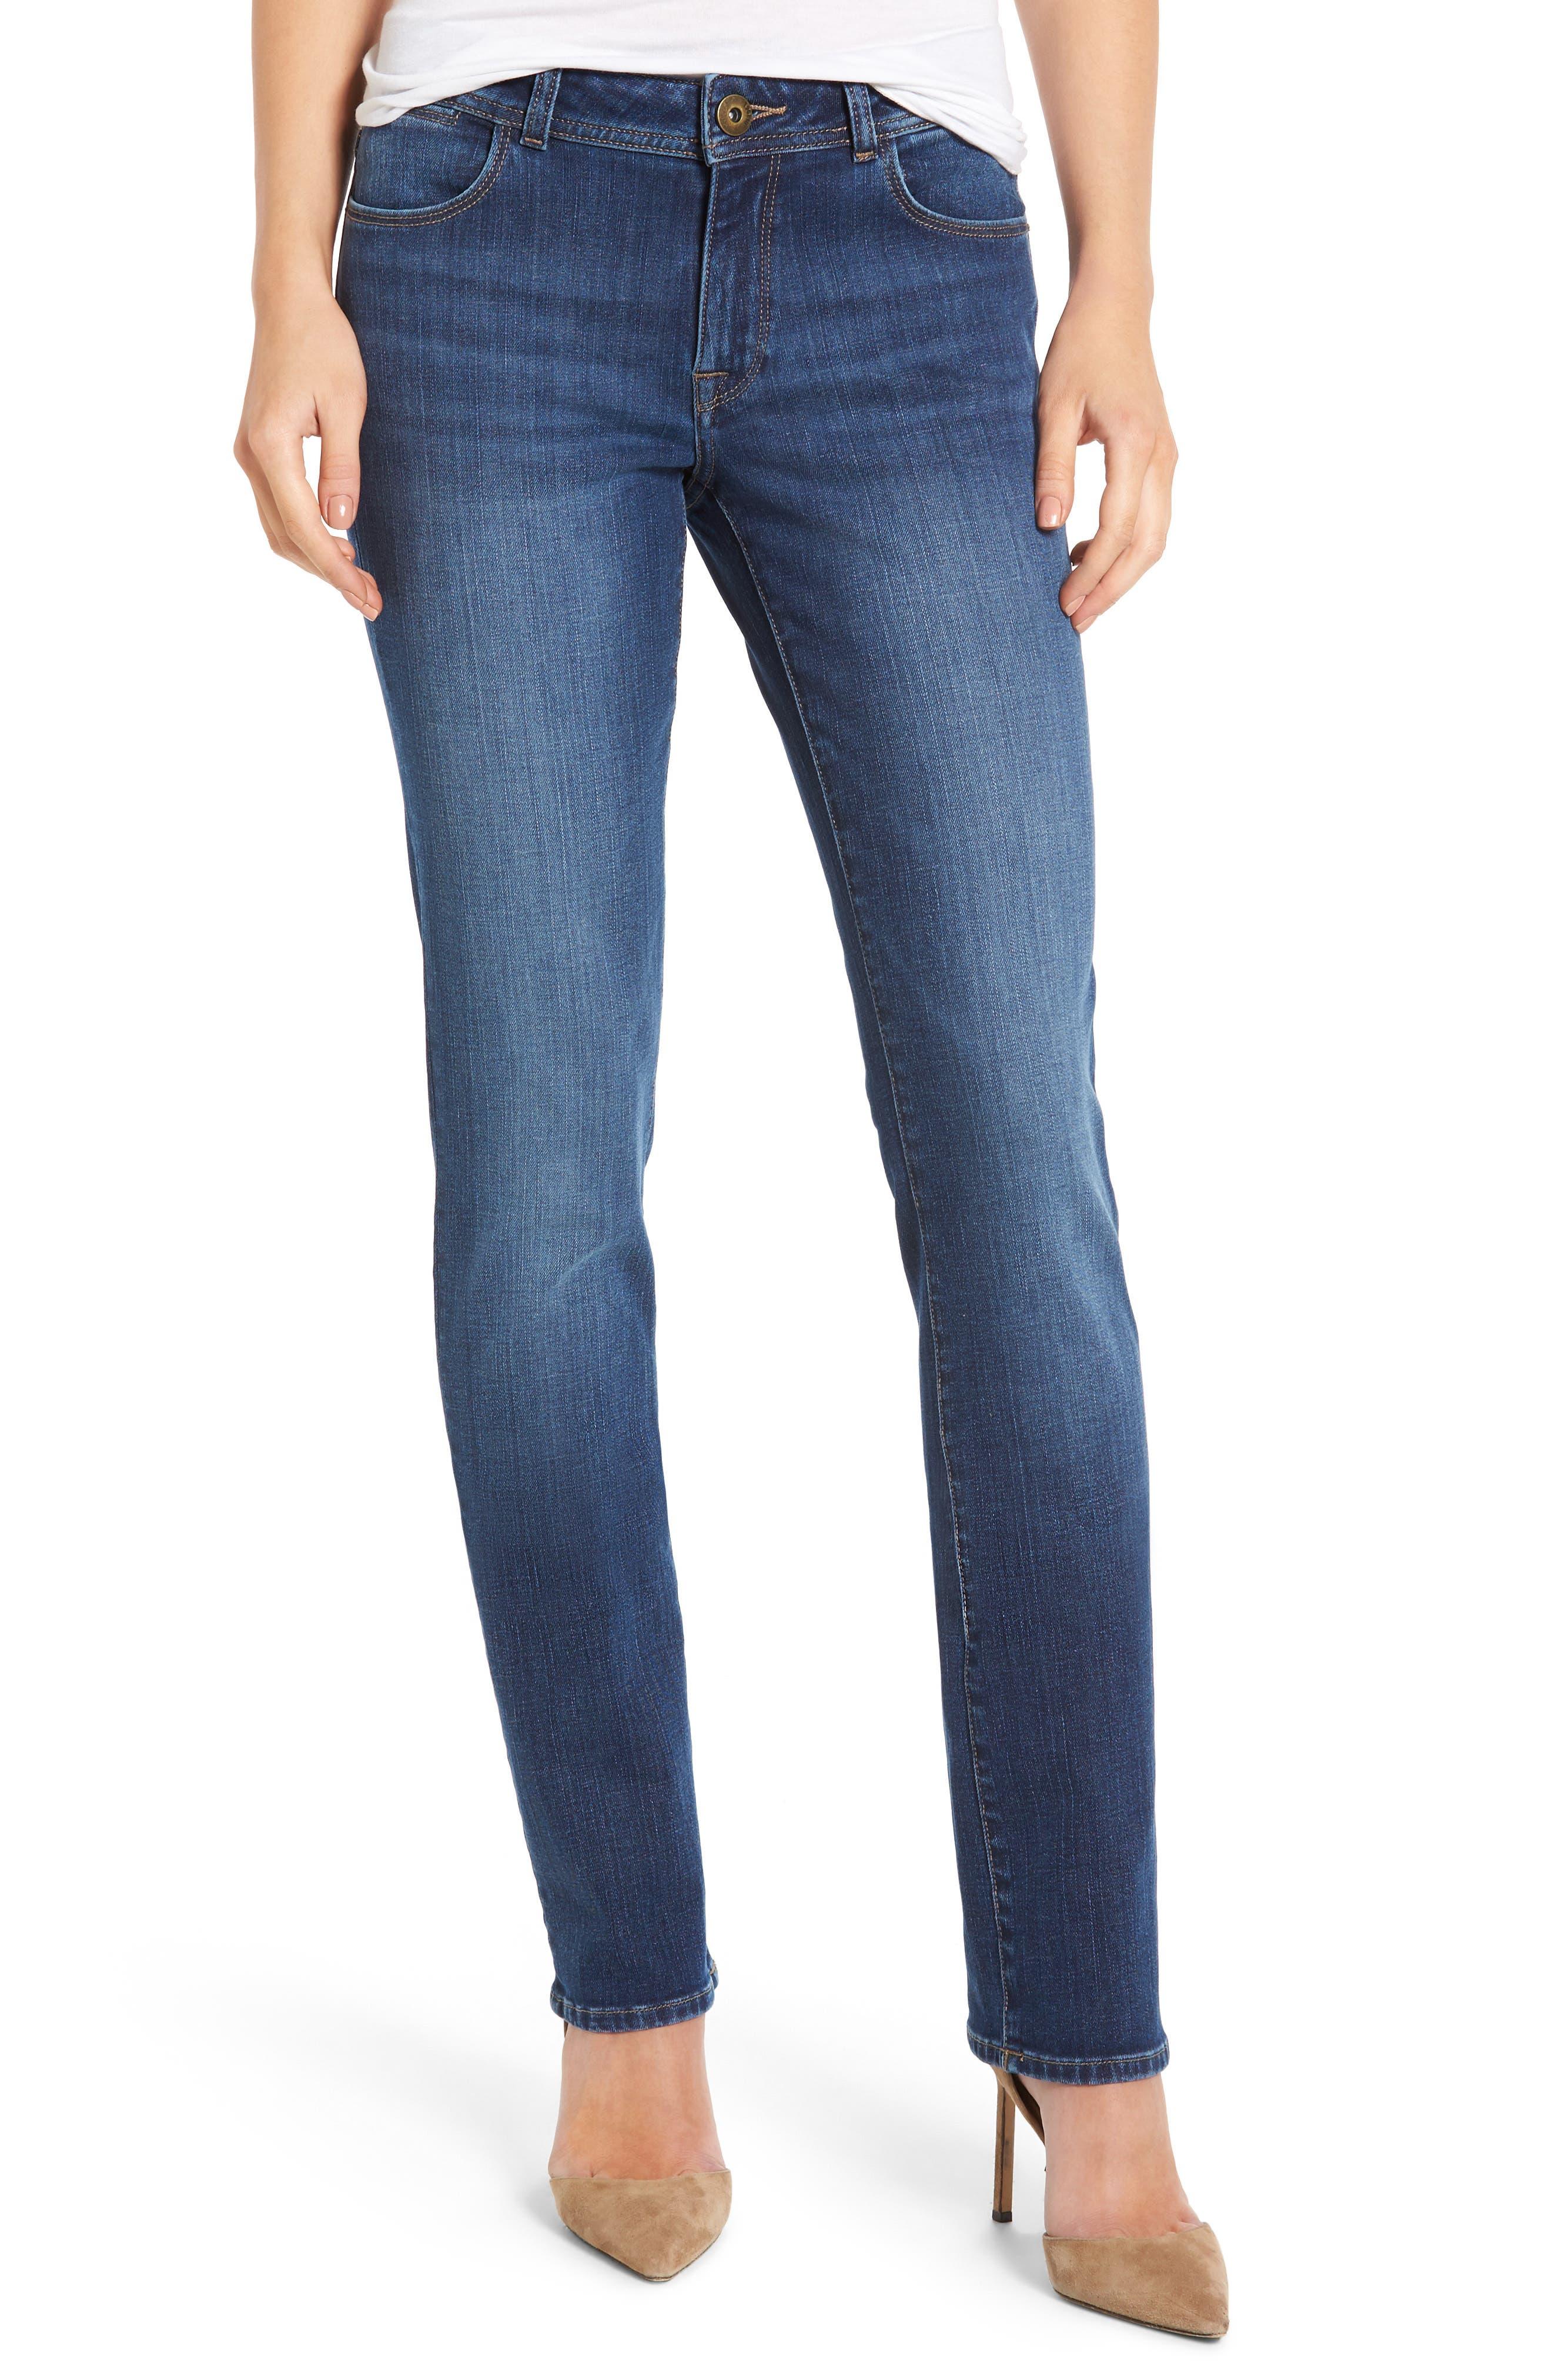 Coco Curvy Straight Leg Jeans,                         Main,                         color, 405